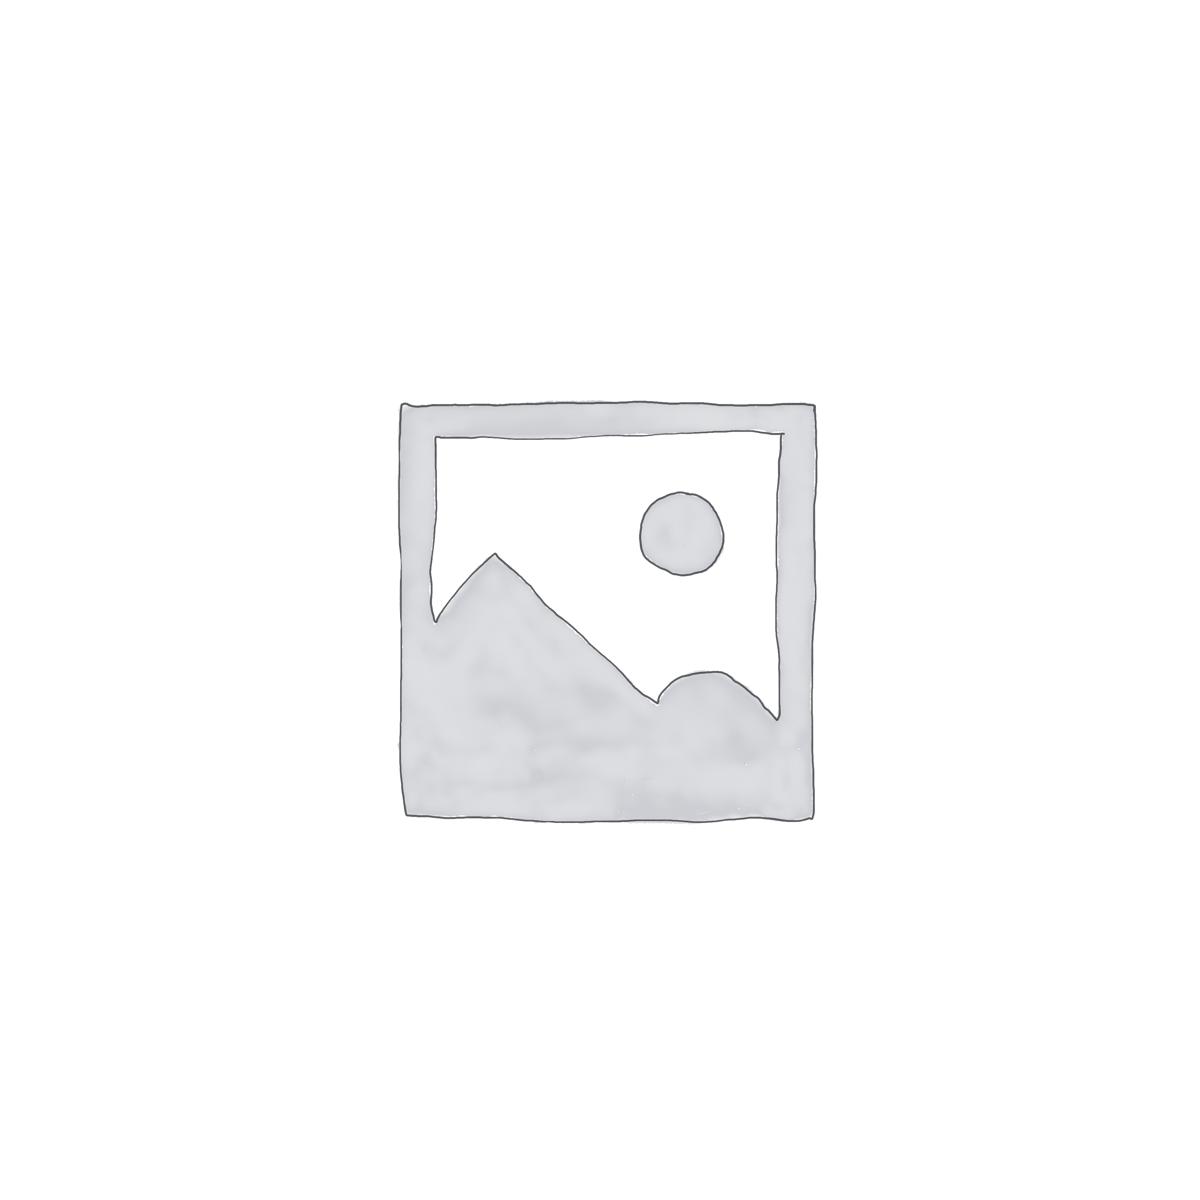 Hansgrohe - Thiết bị vệ sinh cao cấp